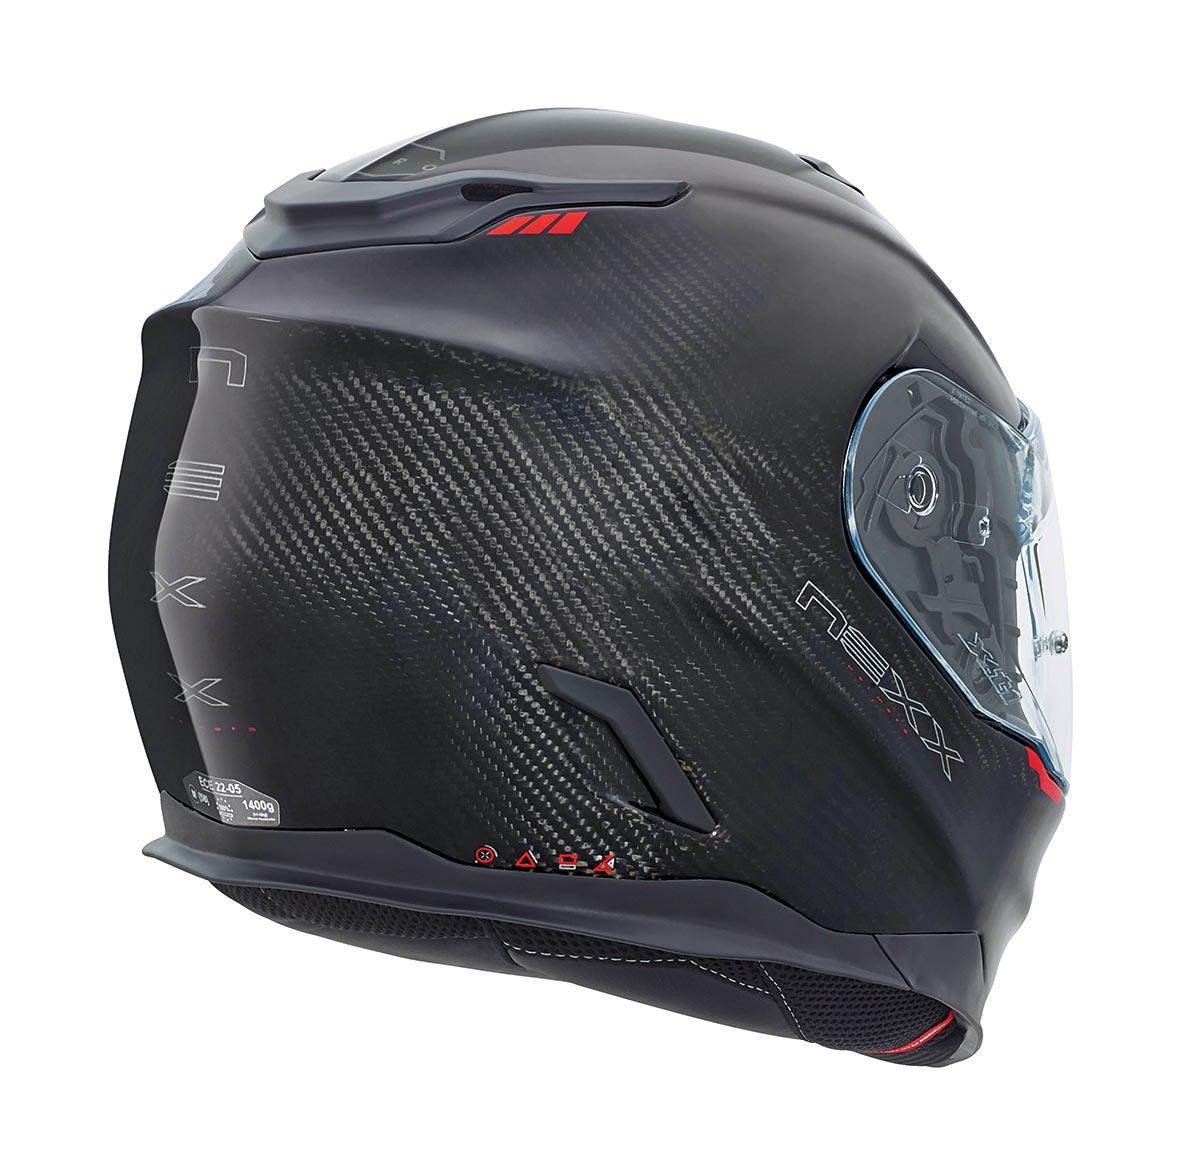 Capacete Nexx XT1 Carbon Zero Lançamento ( PRONTA ENTREGA! )  - Super Bike - Loja Oficial Alpinestars